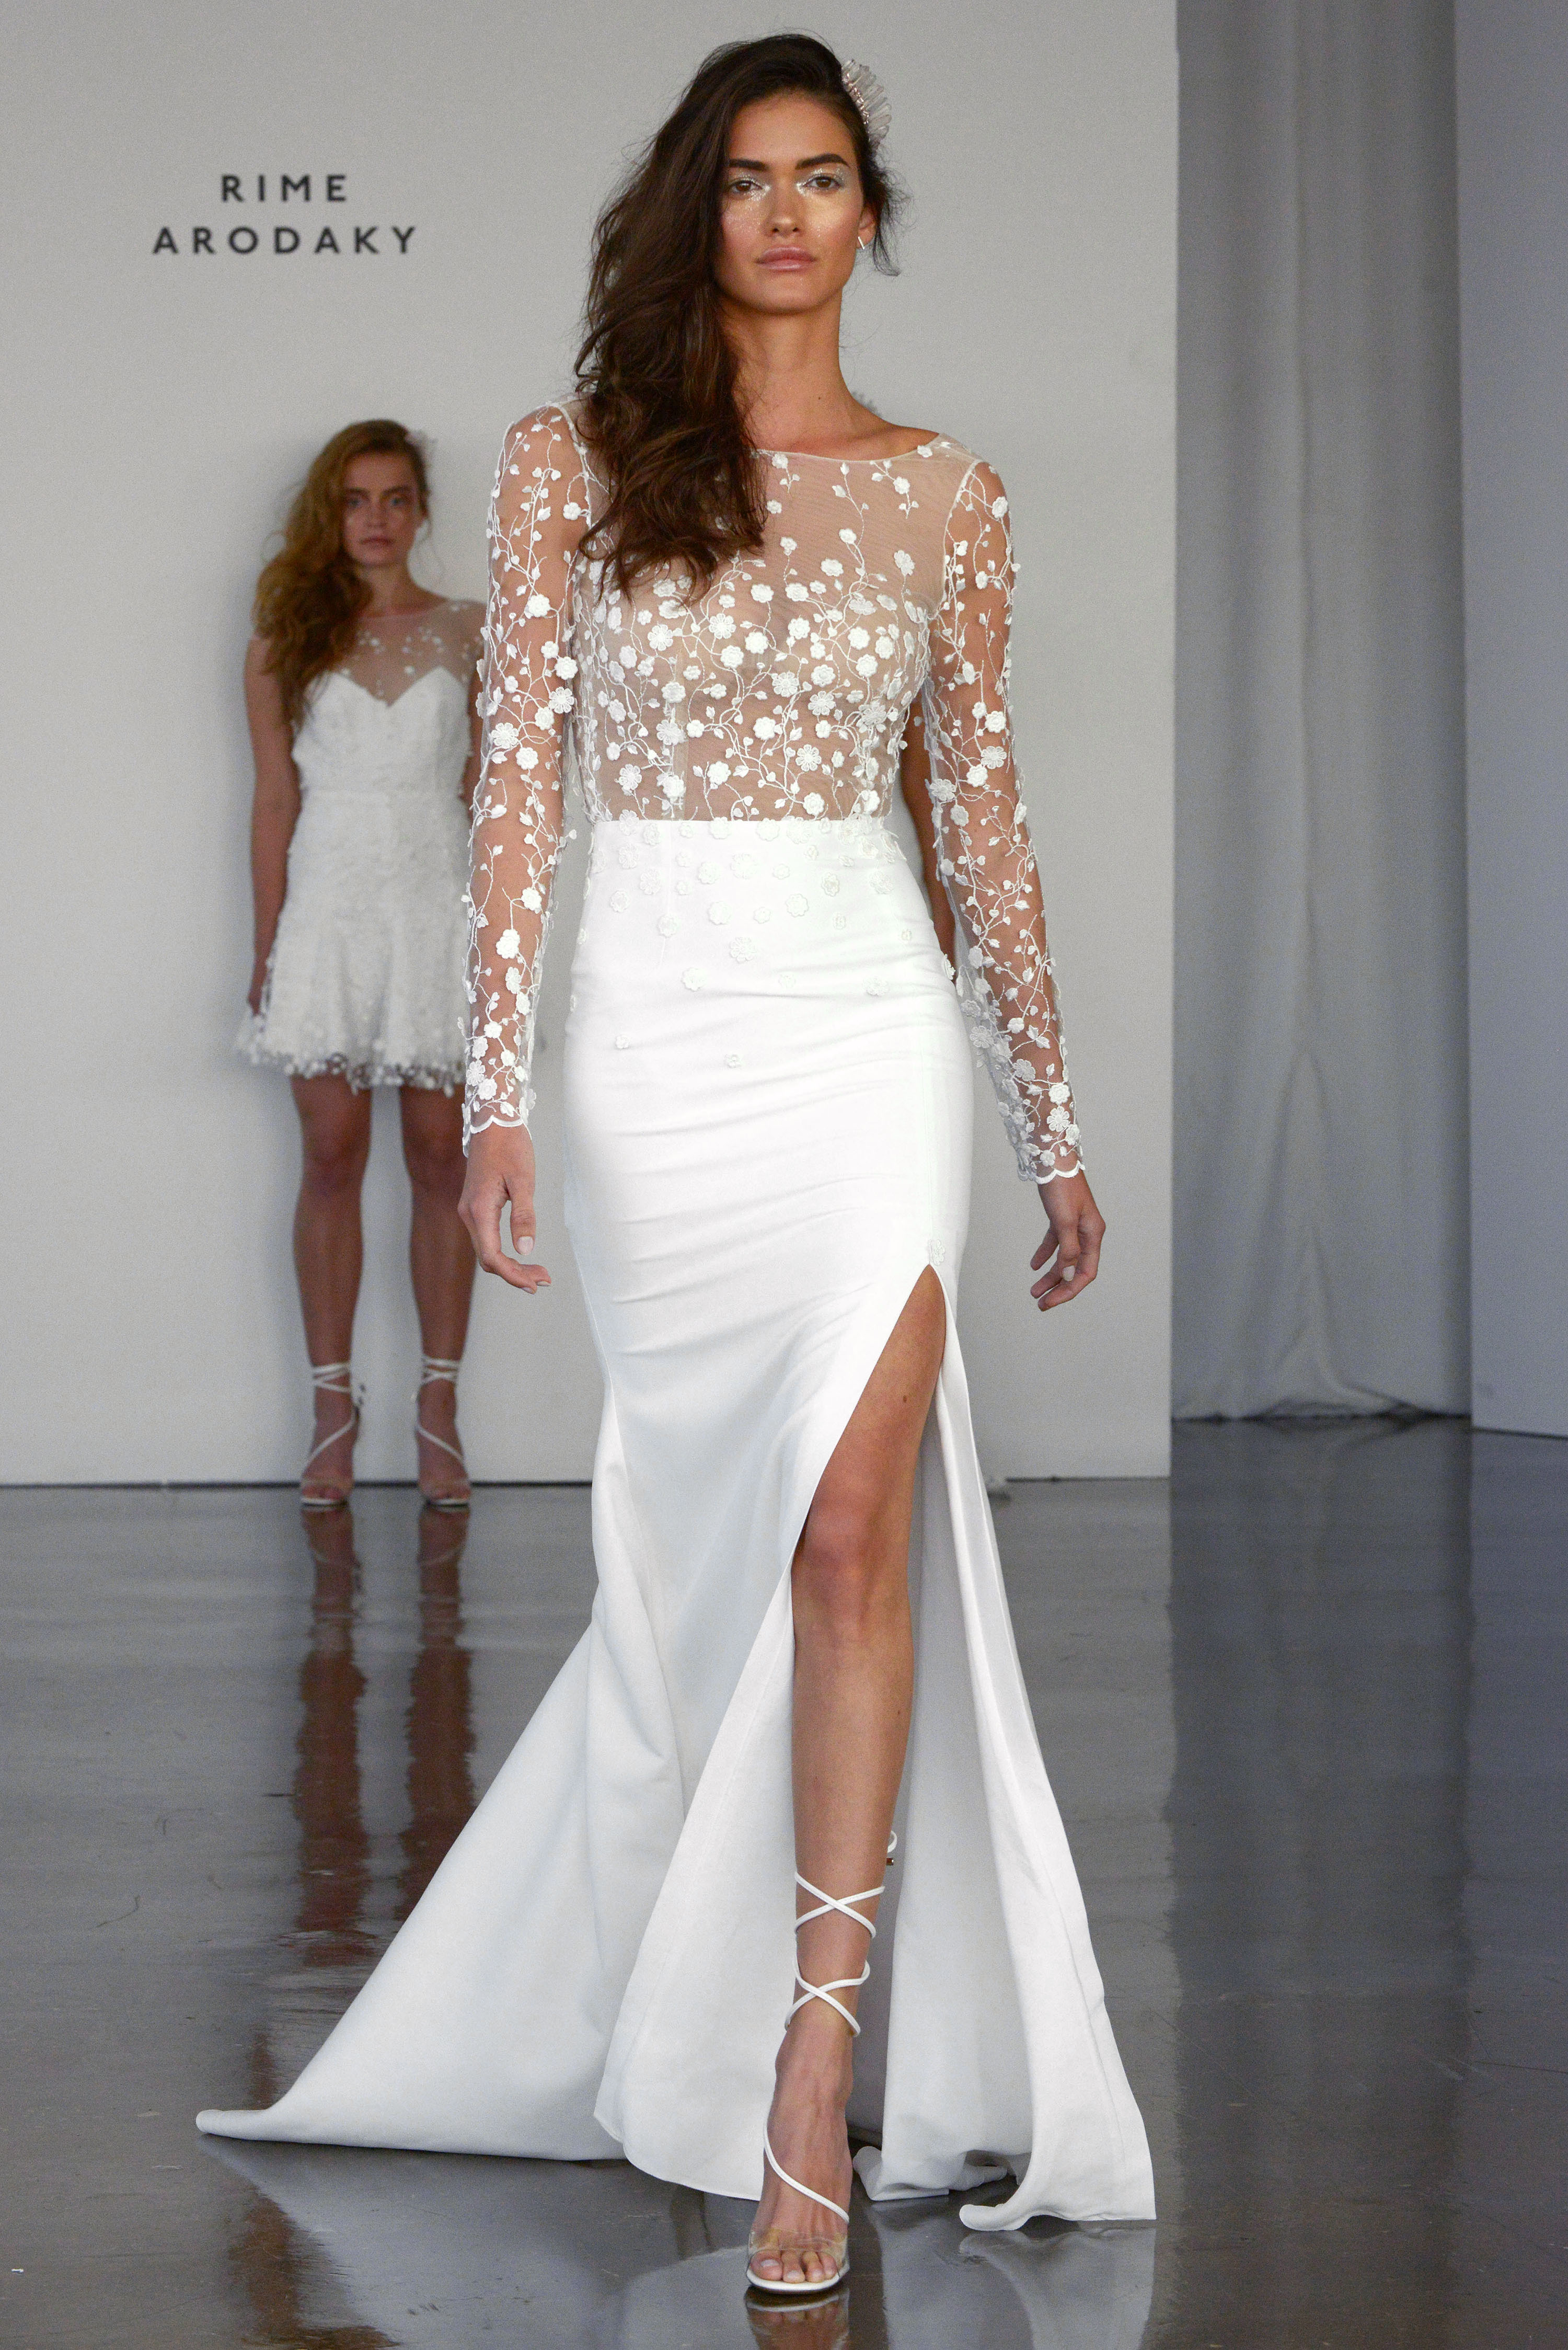 Rime Arodaky wedding dress 19 Fall 2017